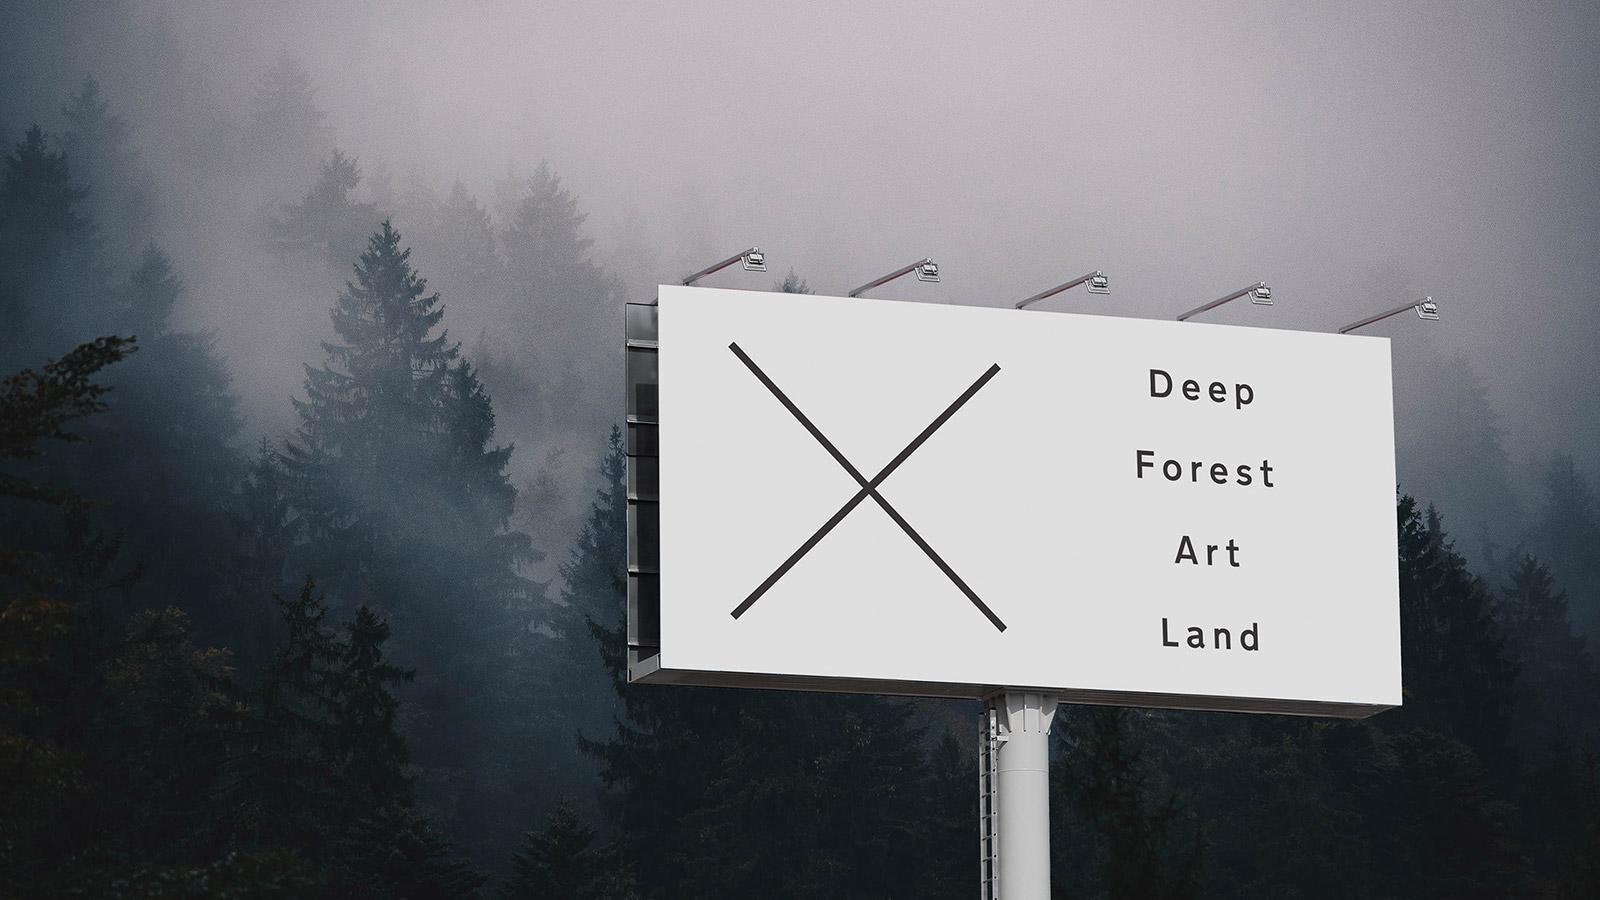 Deep Forest Art Land billboard